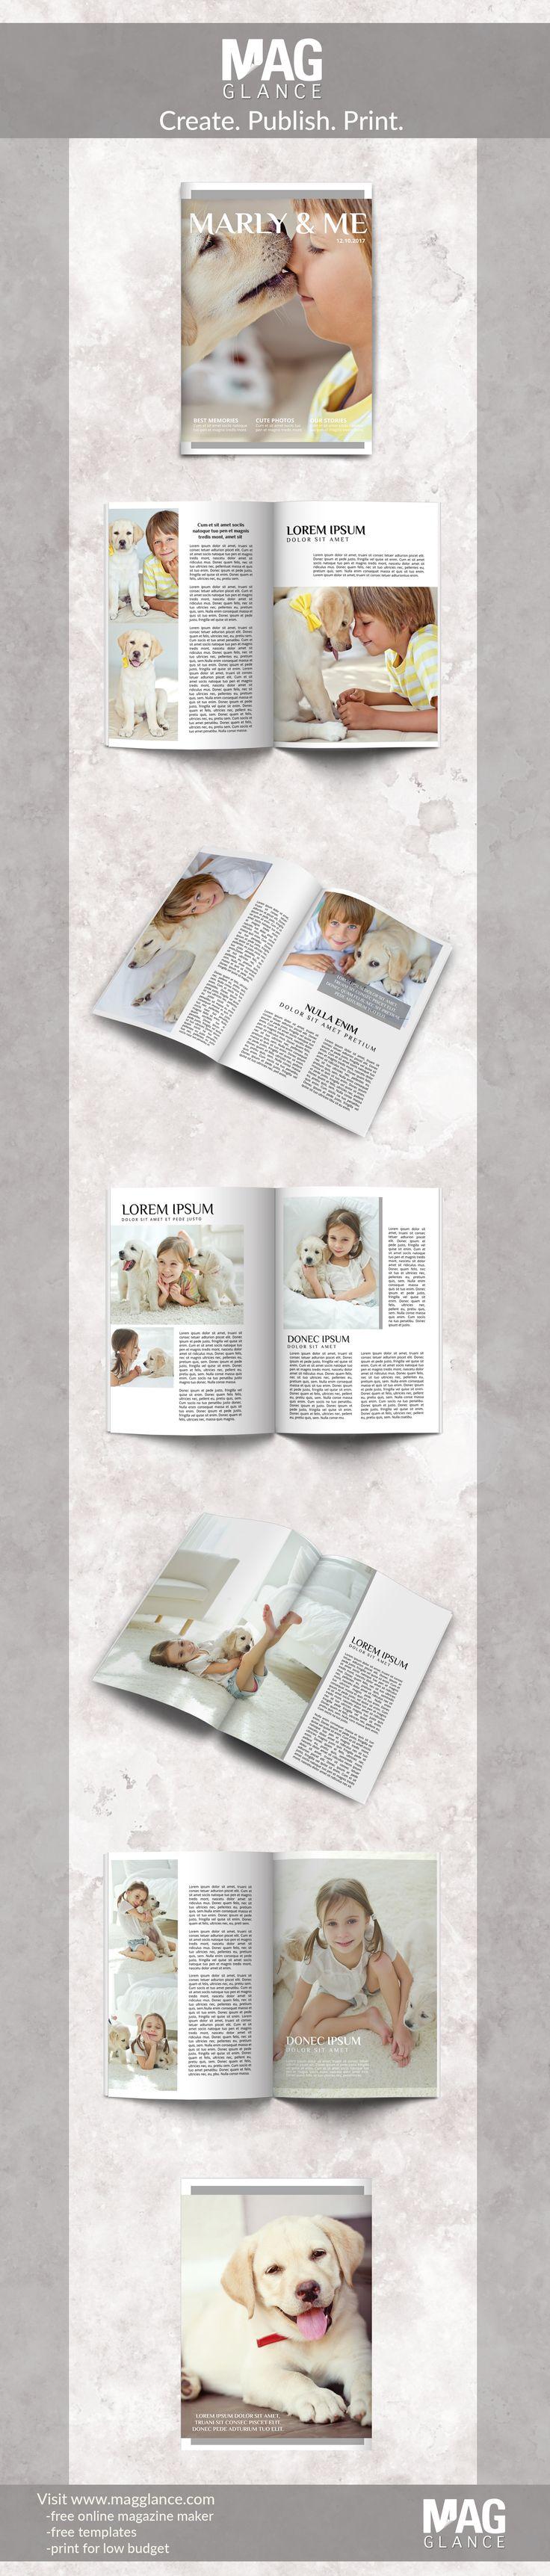 25 einzigartige fotobuch gestalten ideen auf pinterest fotoalbum gestalten ideen. Black Bedroom Furniture Sets. Home Design Ideas